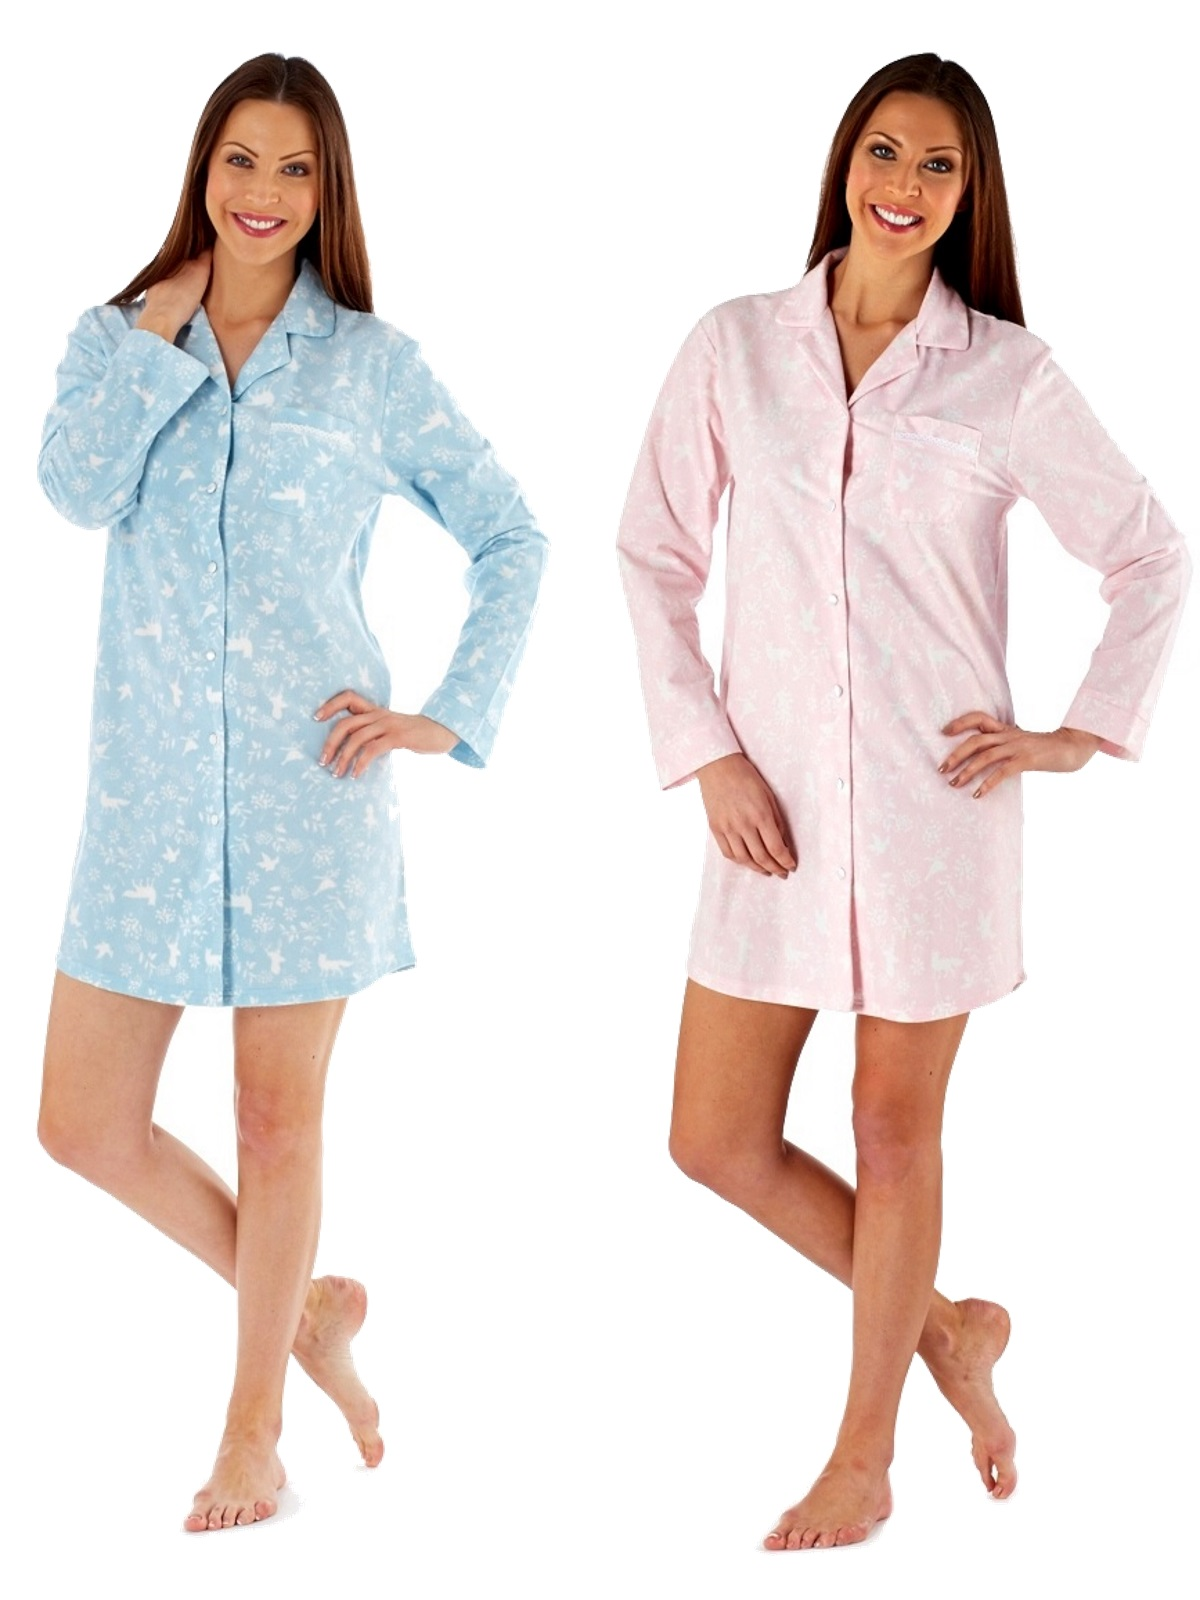 Womens Fleece Nightdress Nightshirt Nighty Nursing Pyjamas Ladies Size UK  10-20 3f743841a